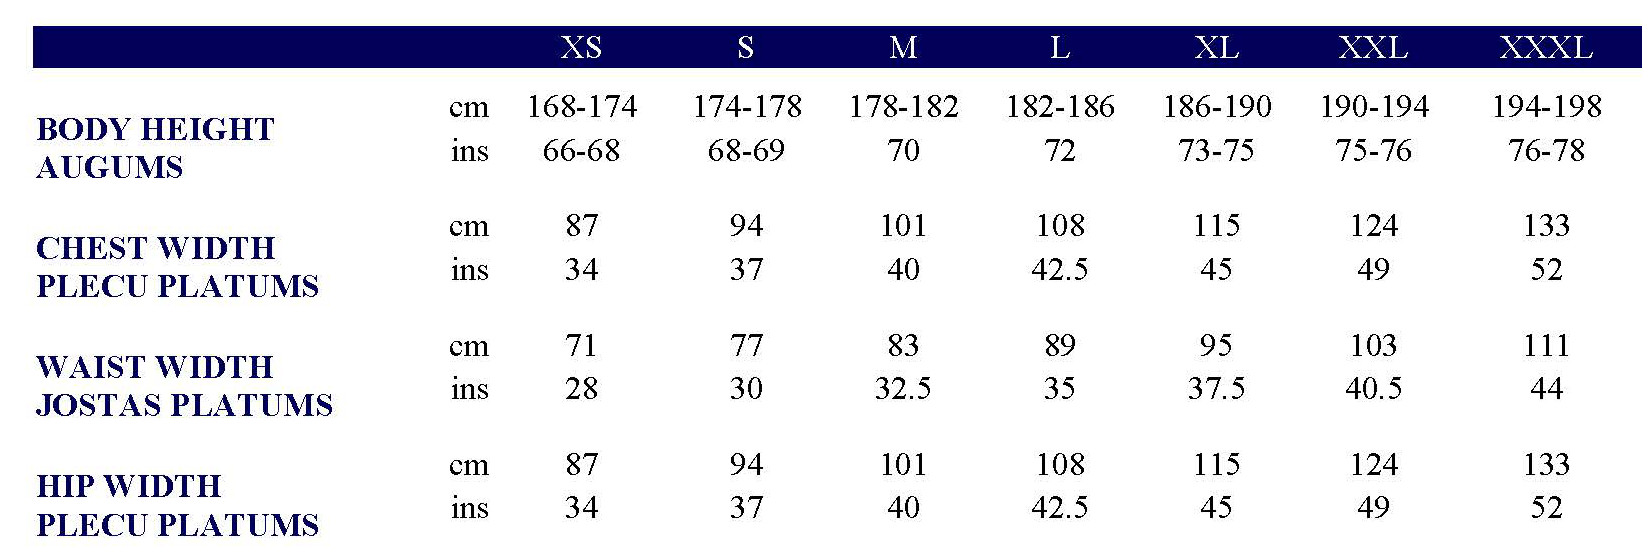 Asics Men's clothing size chart